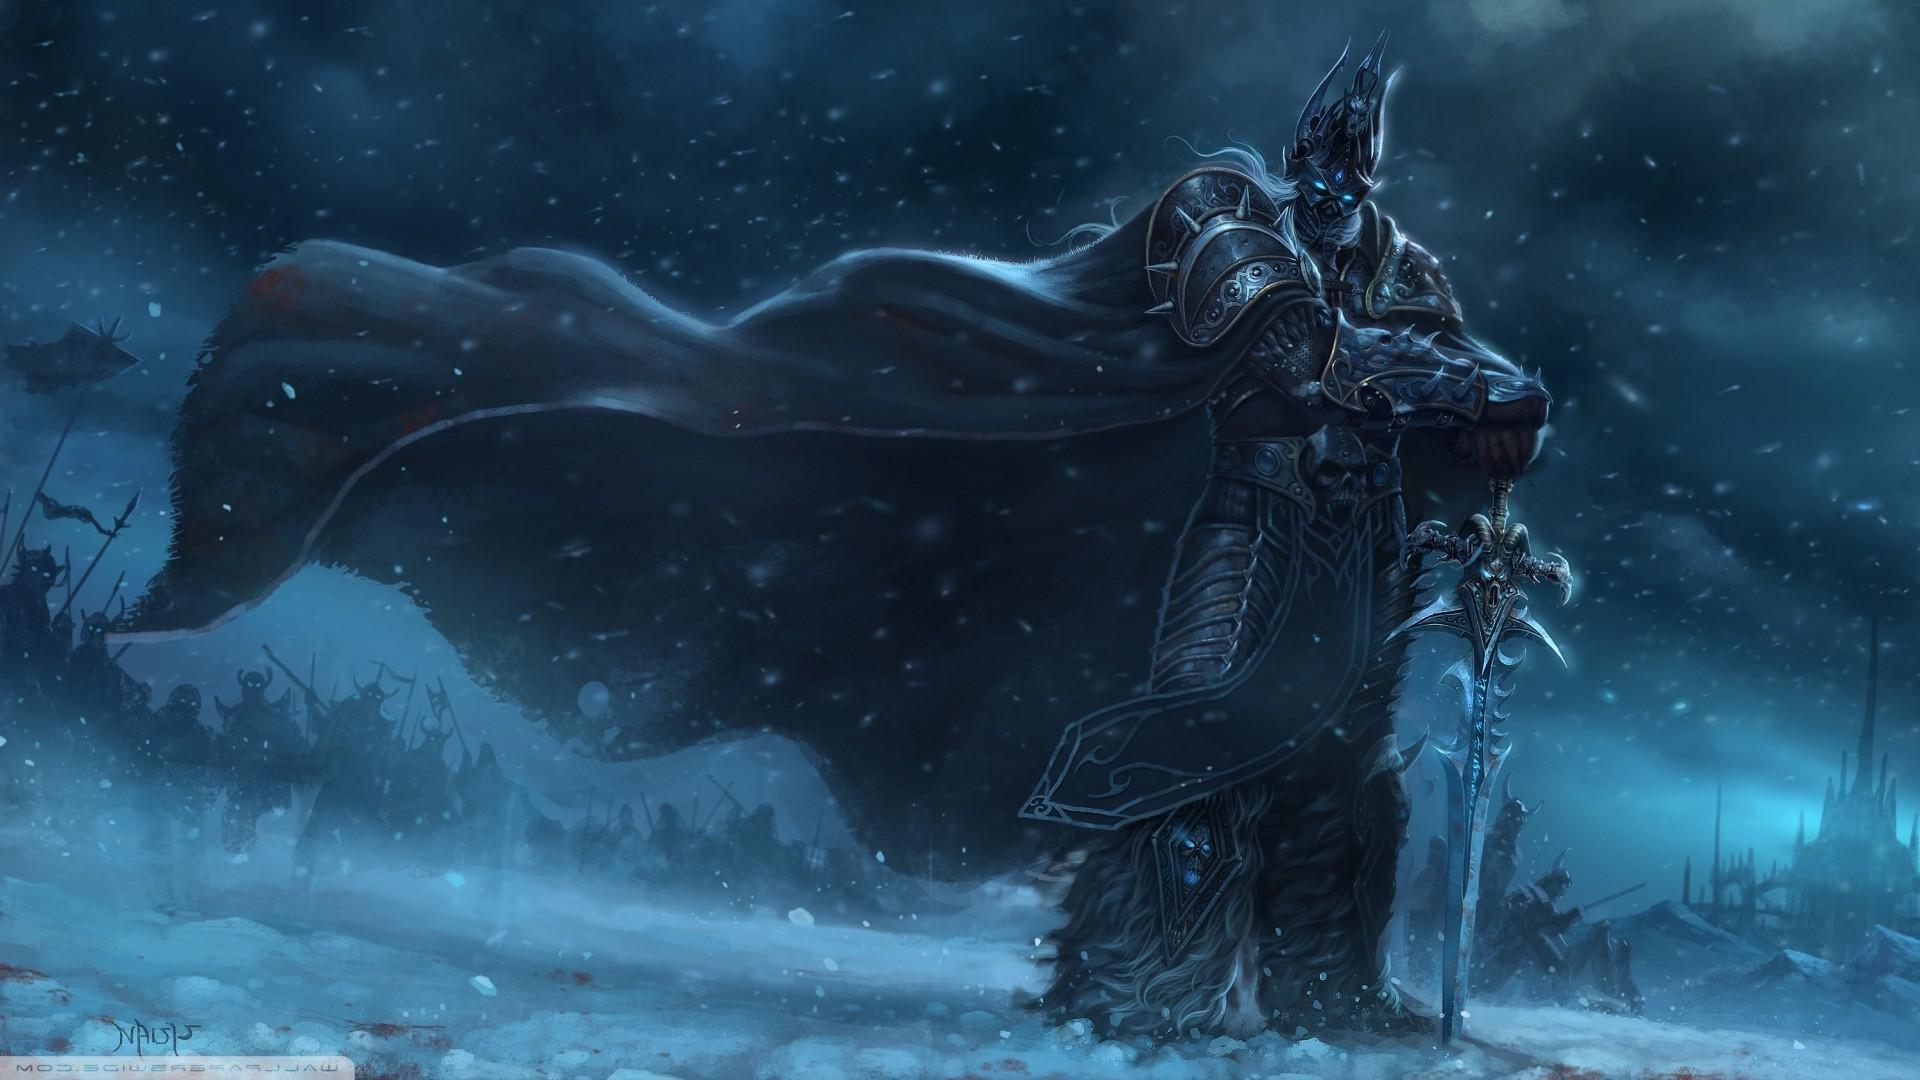 World Of Warcraft Wallpaper 1920x1080: Arthas Wallpaper (76+ Images